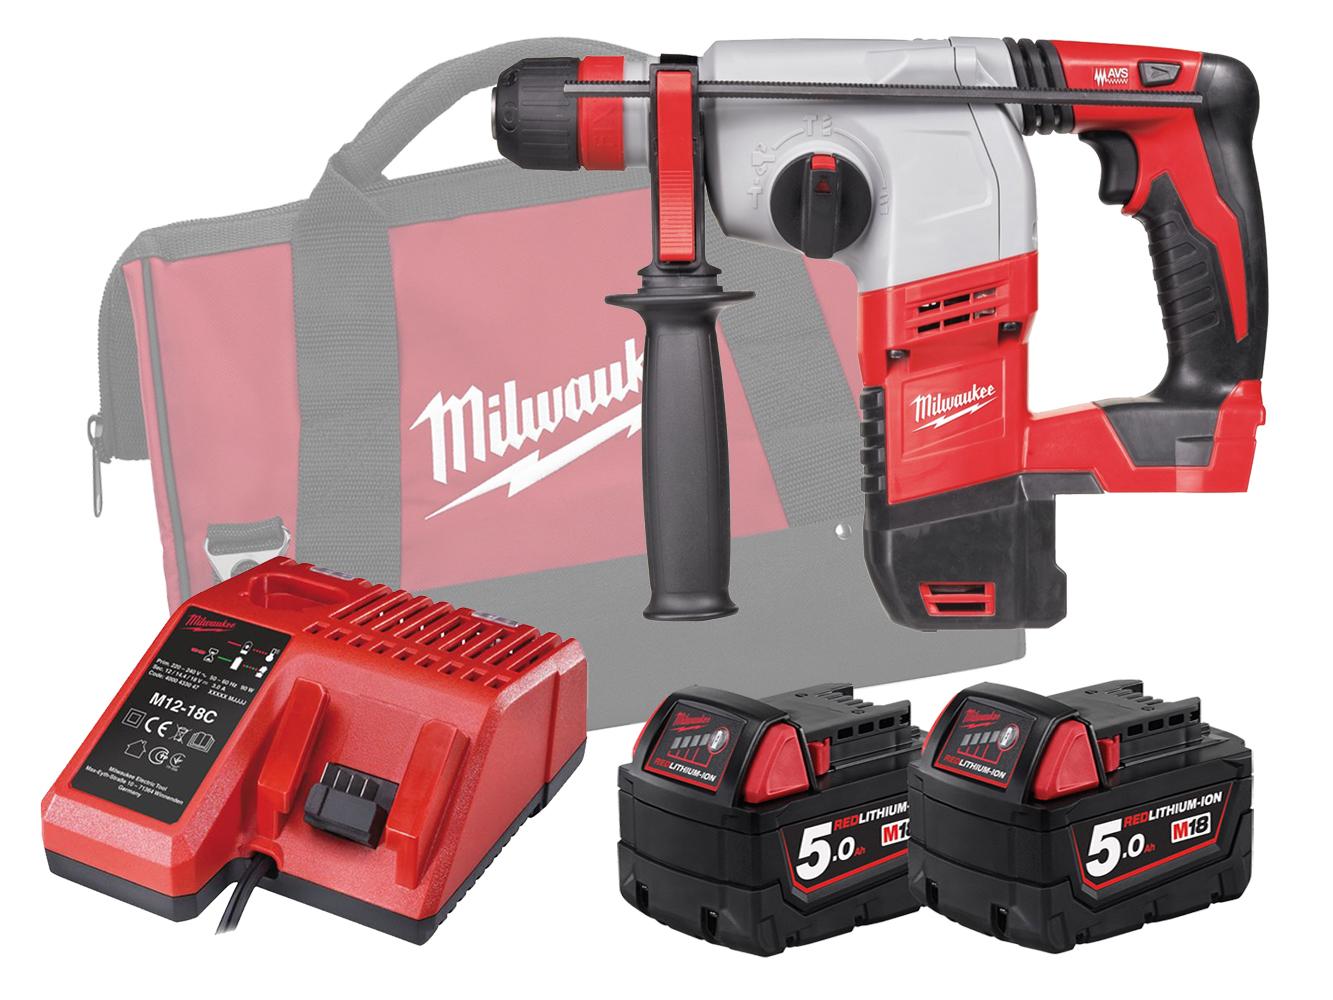 Milwaukee HD18HX 18V Brushed 3-Mode SDS Plus Hammer - 5.0Ah Pack